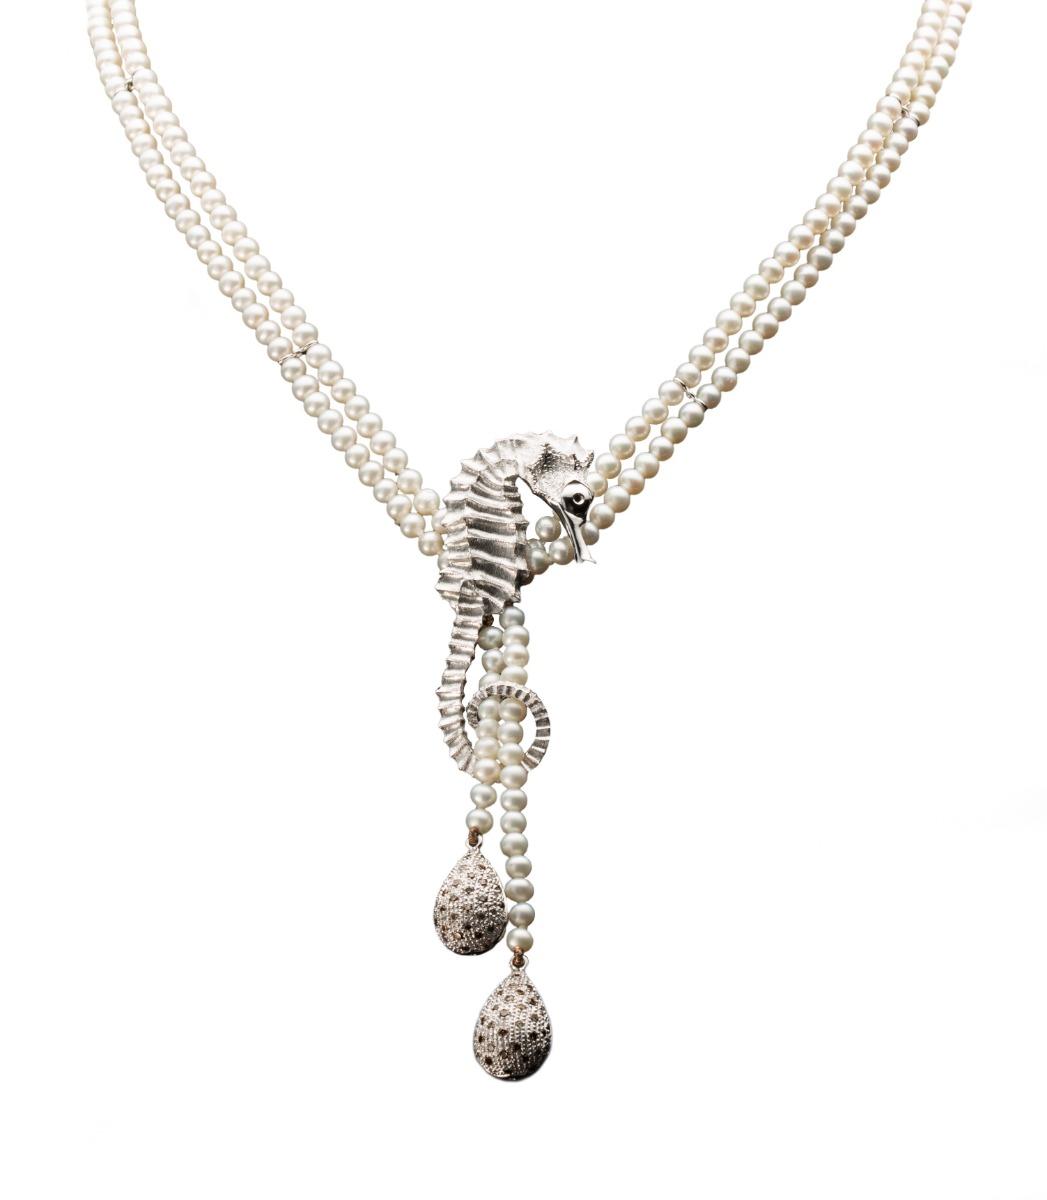 Hippocampus Necklace